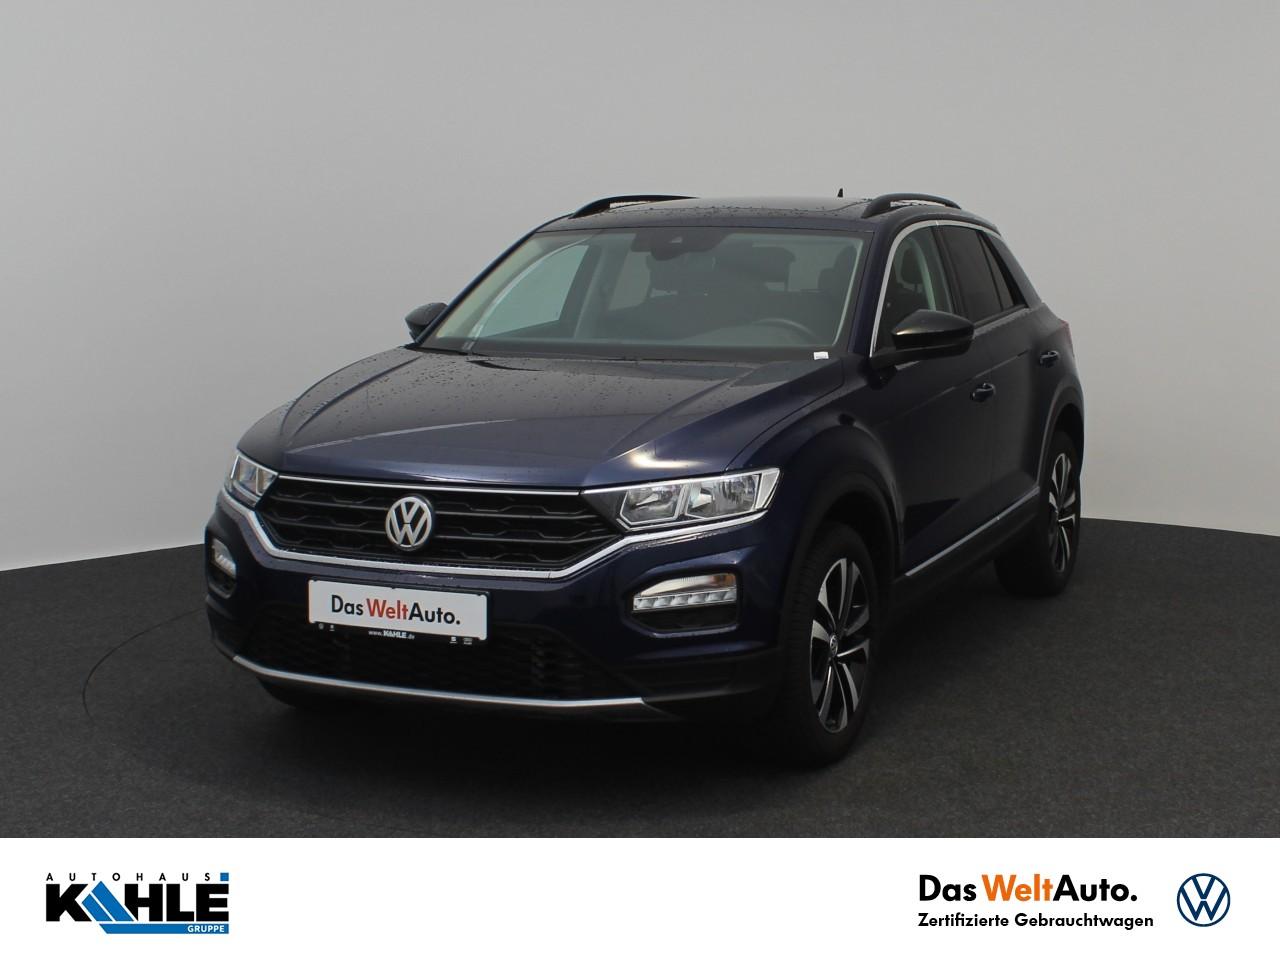 Volkswagen T-Roc 1.5 TSI IQ.Drive Navi Panorama Standh. Klima ACC, Jahr 2020, Benzin